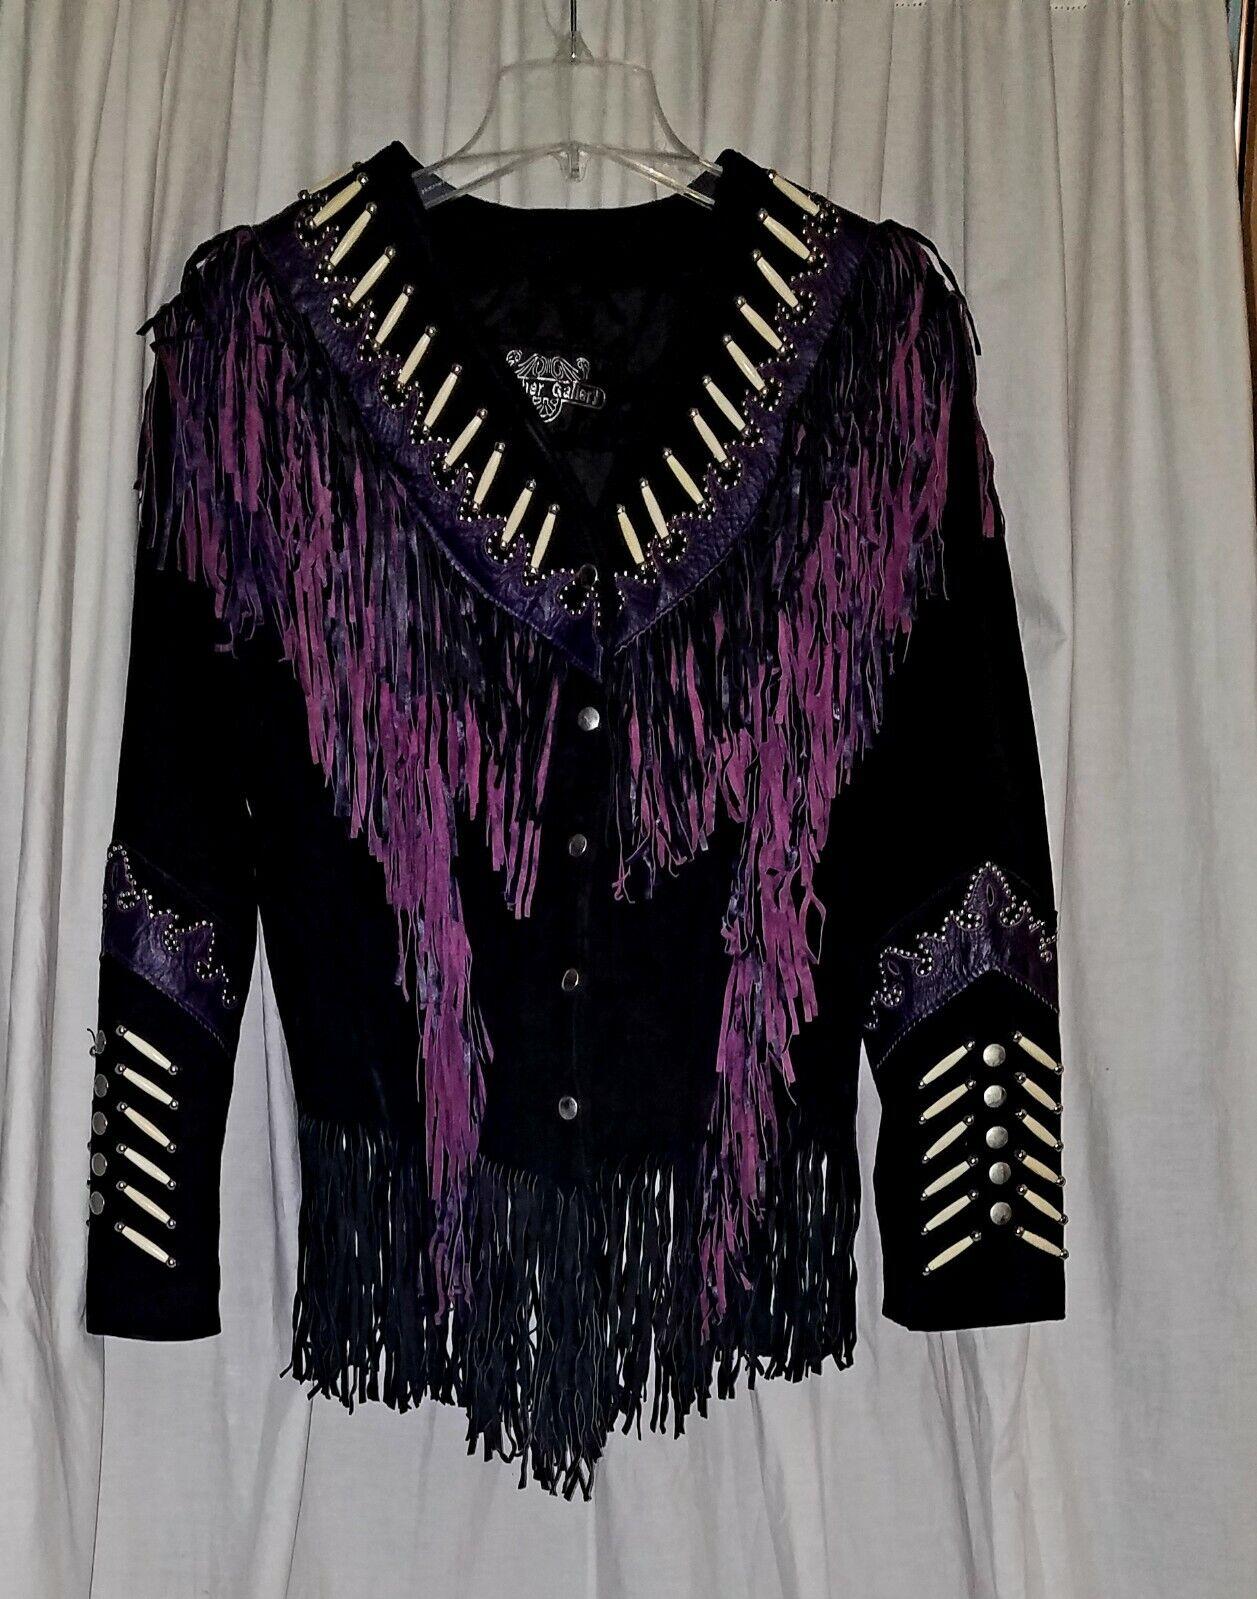 Vintage Black Purple Suede Leather Fringe Jacket - Leather Gallery Size XXL